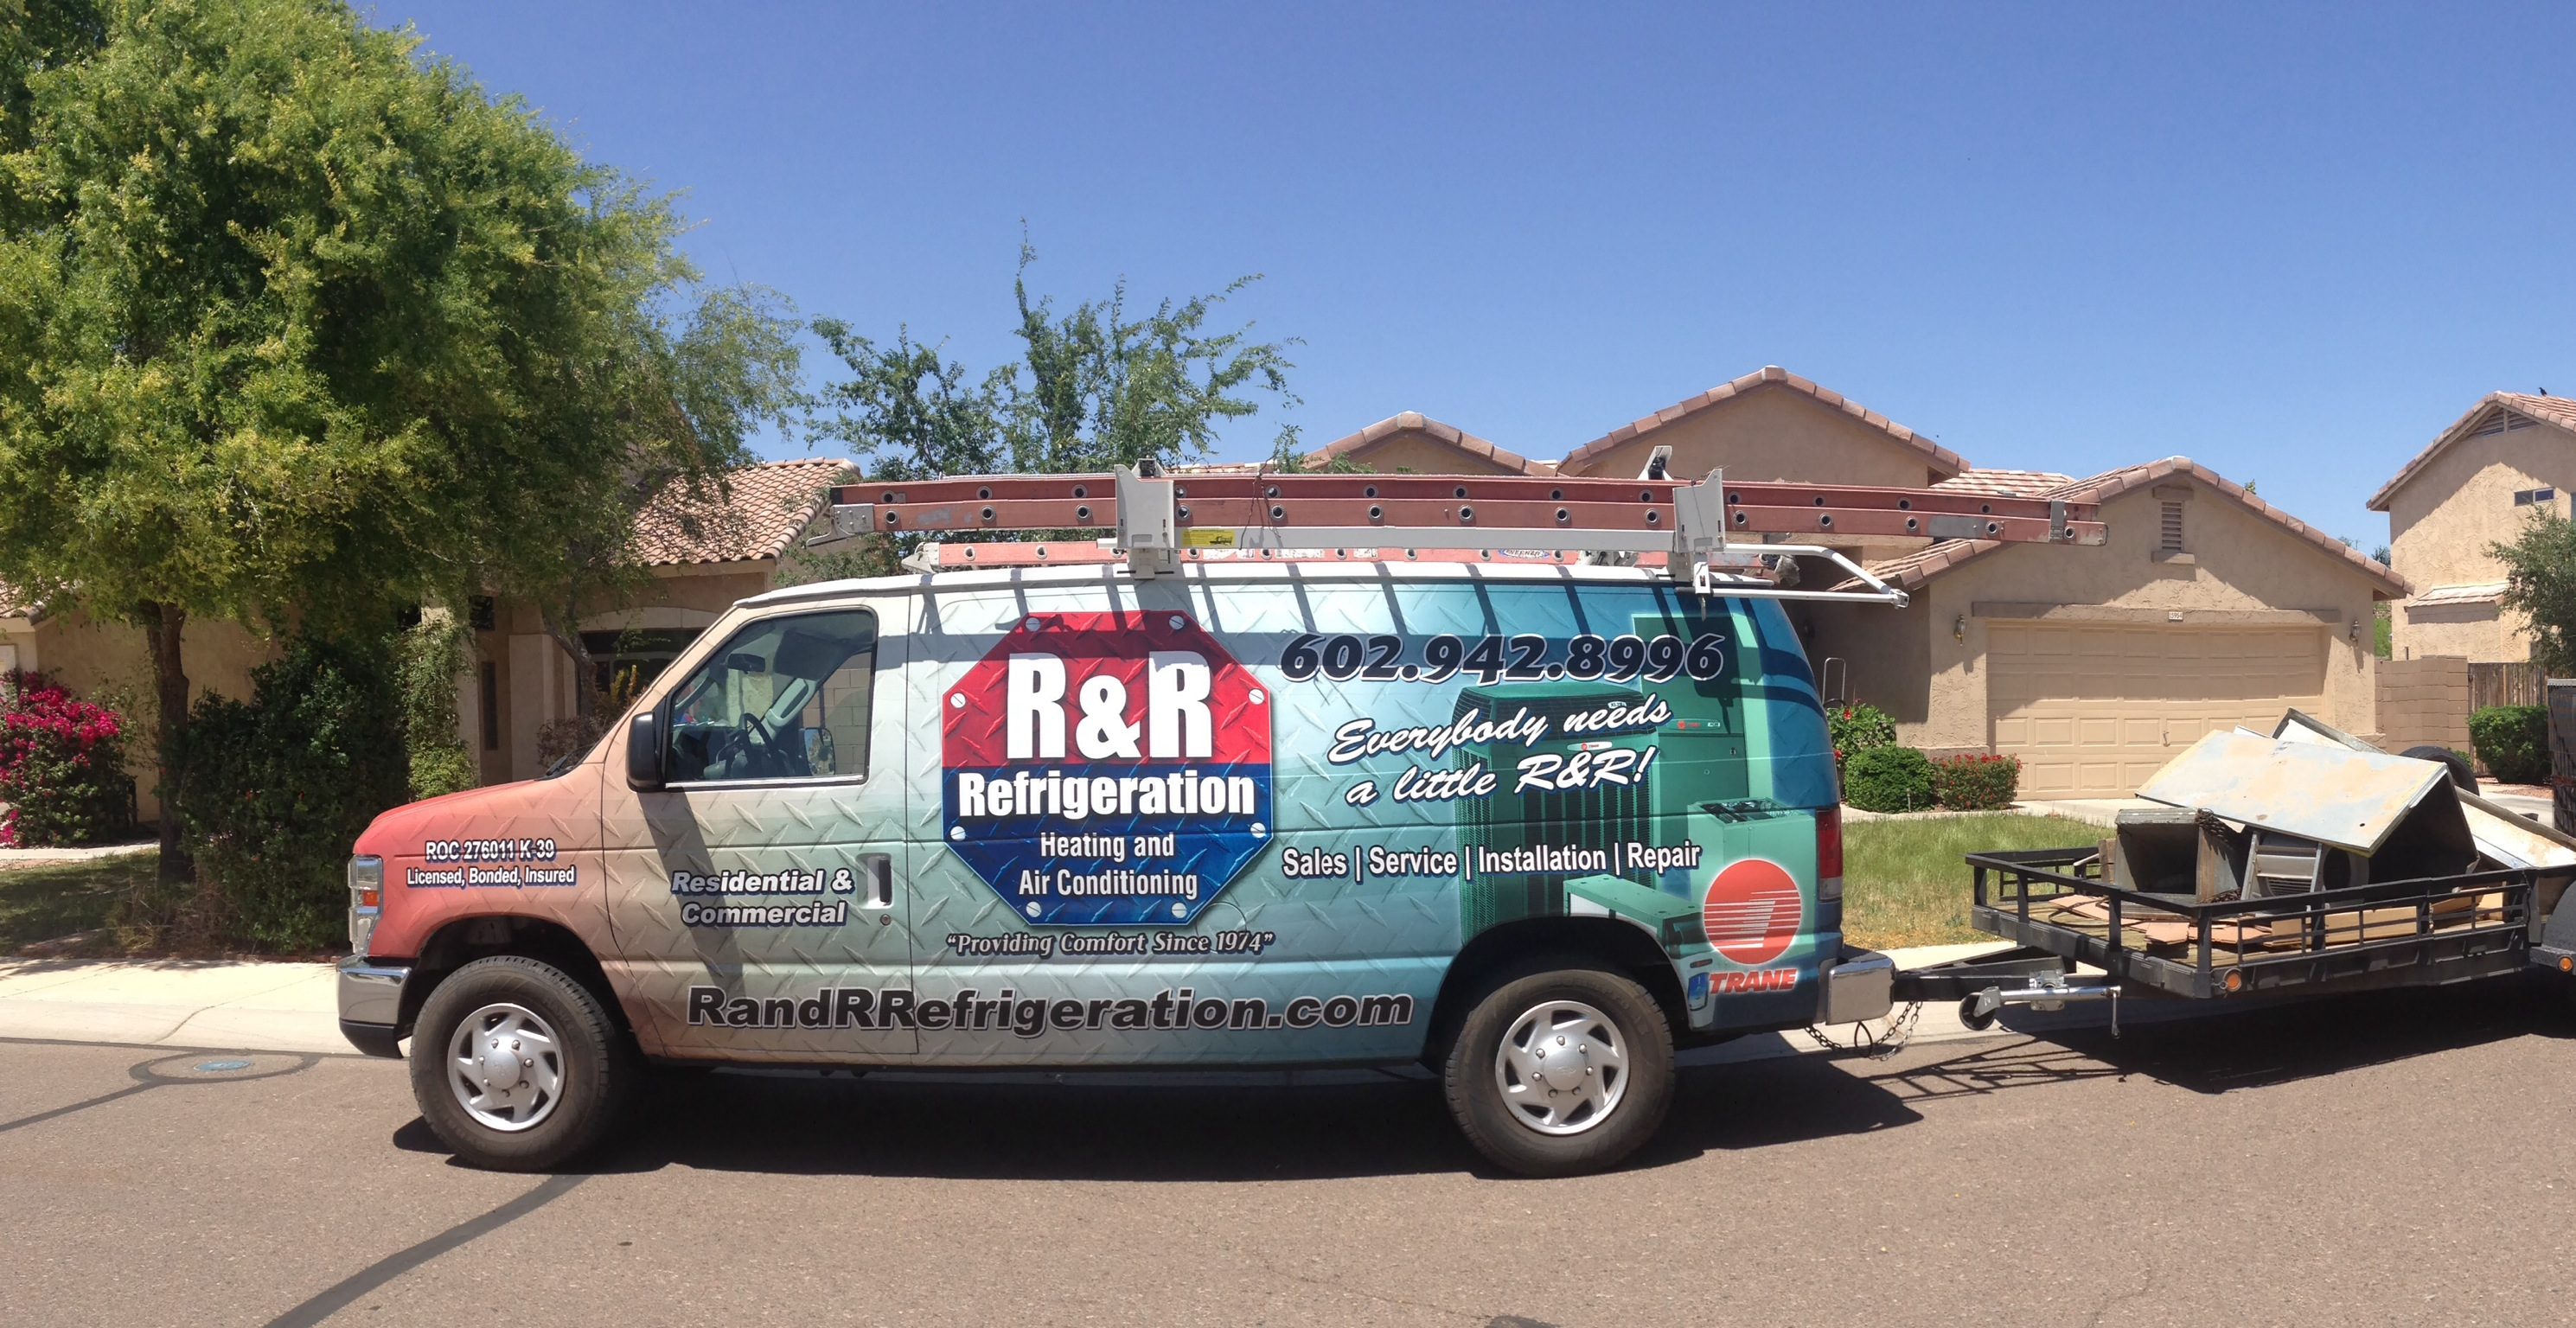 R&R_van-R&RRefrigeration-PhoenixAZ.jpg